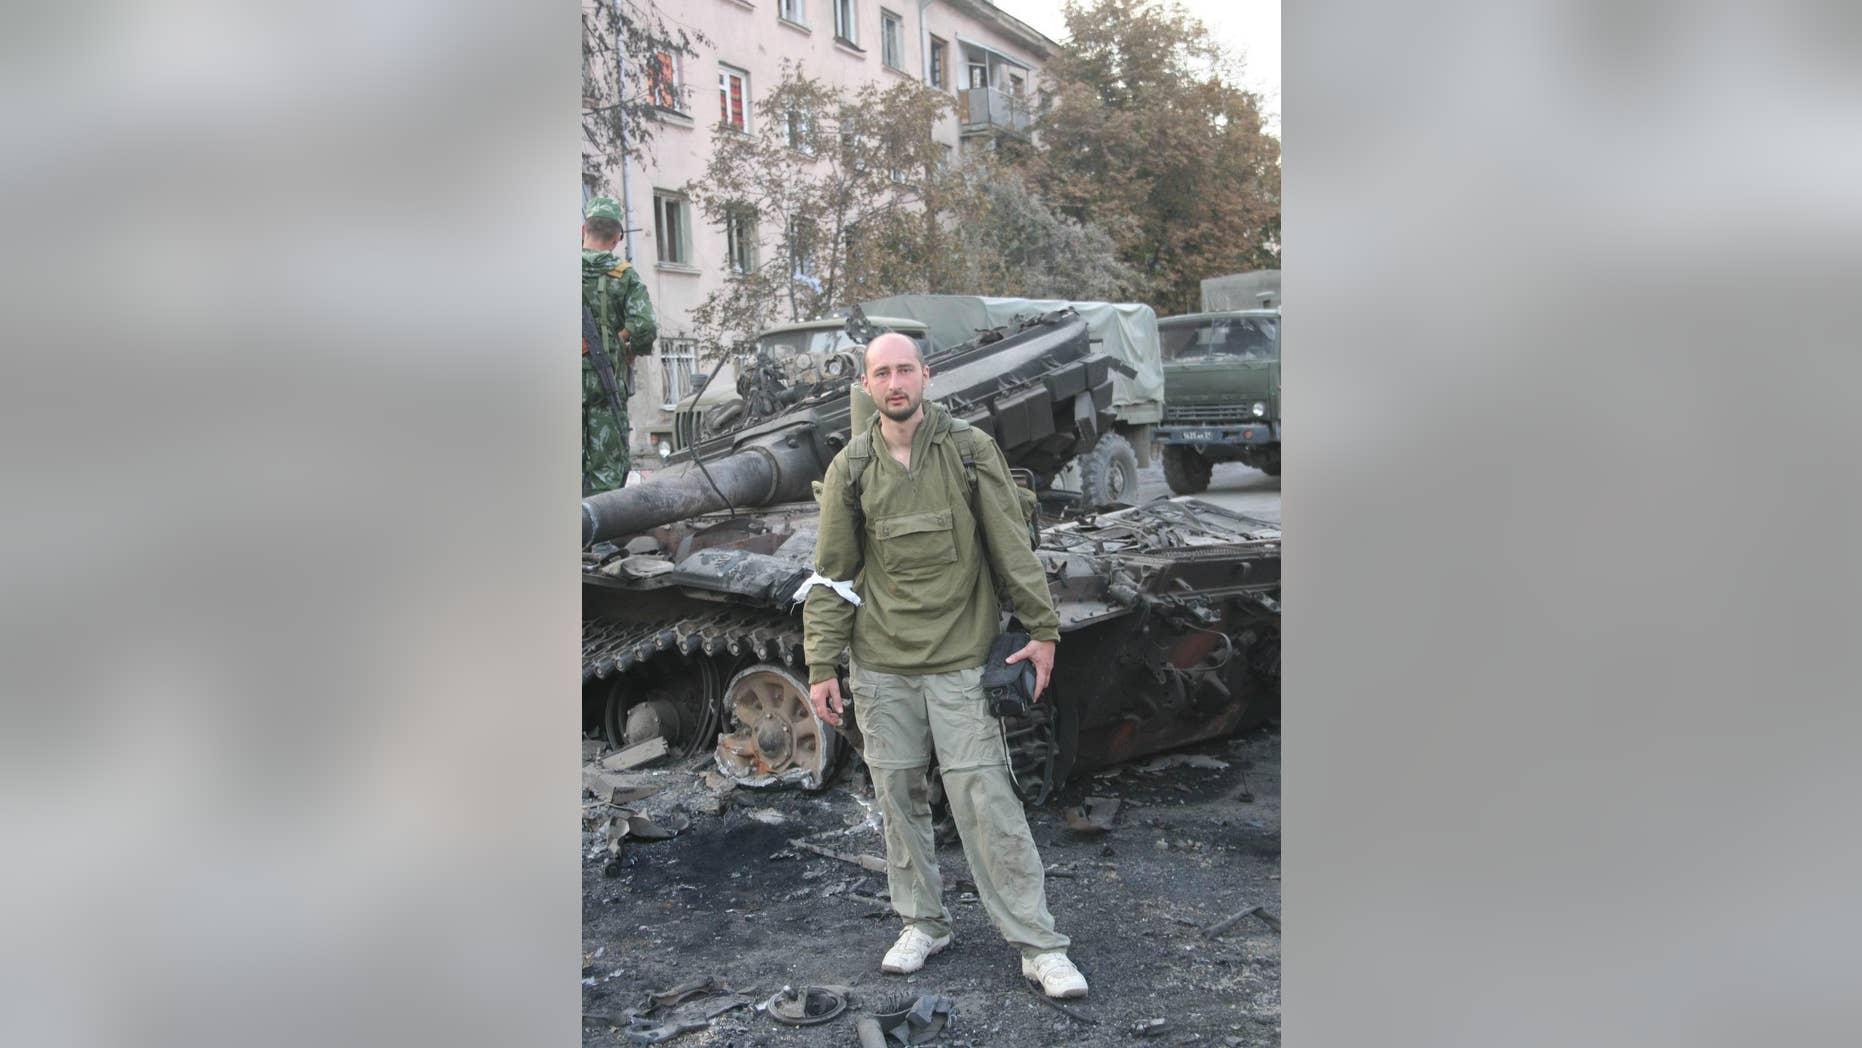 Russian journalist Arkady Babchenko was fatally shot at his apartment in Kiev, Ukrainian police said Tuesday.